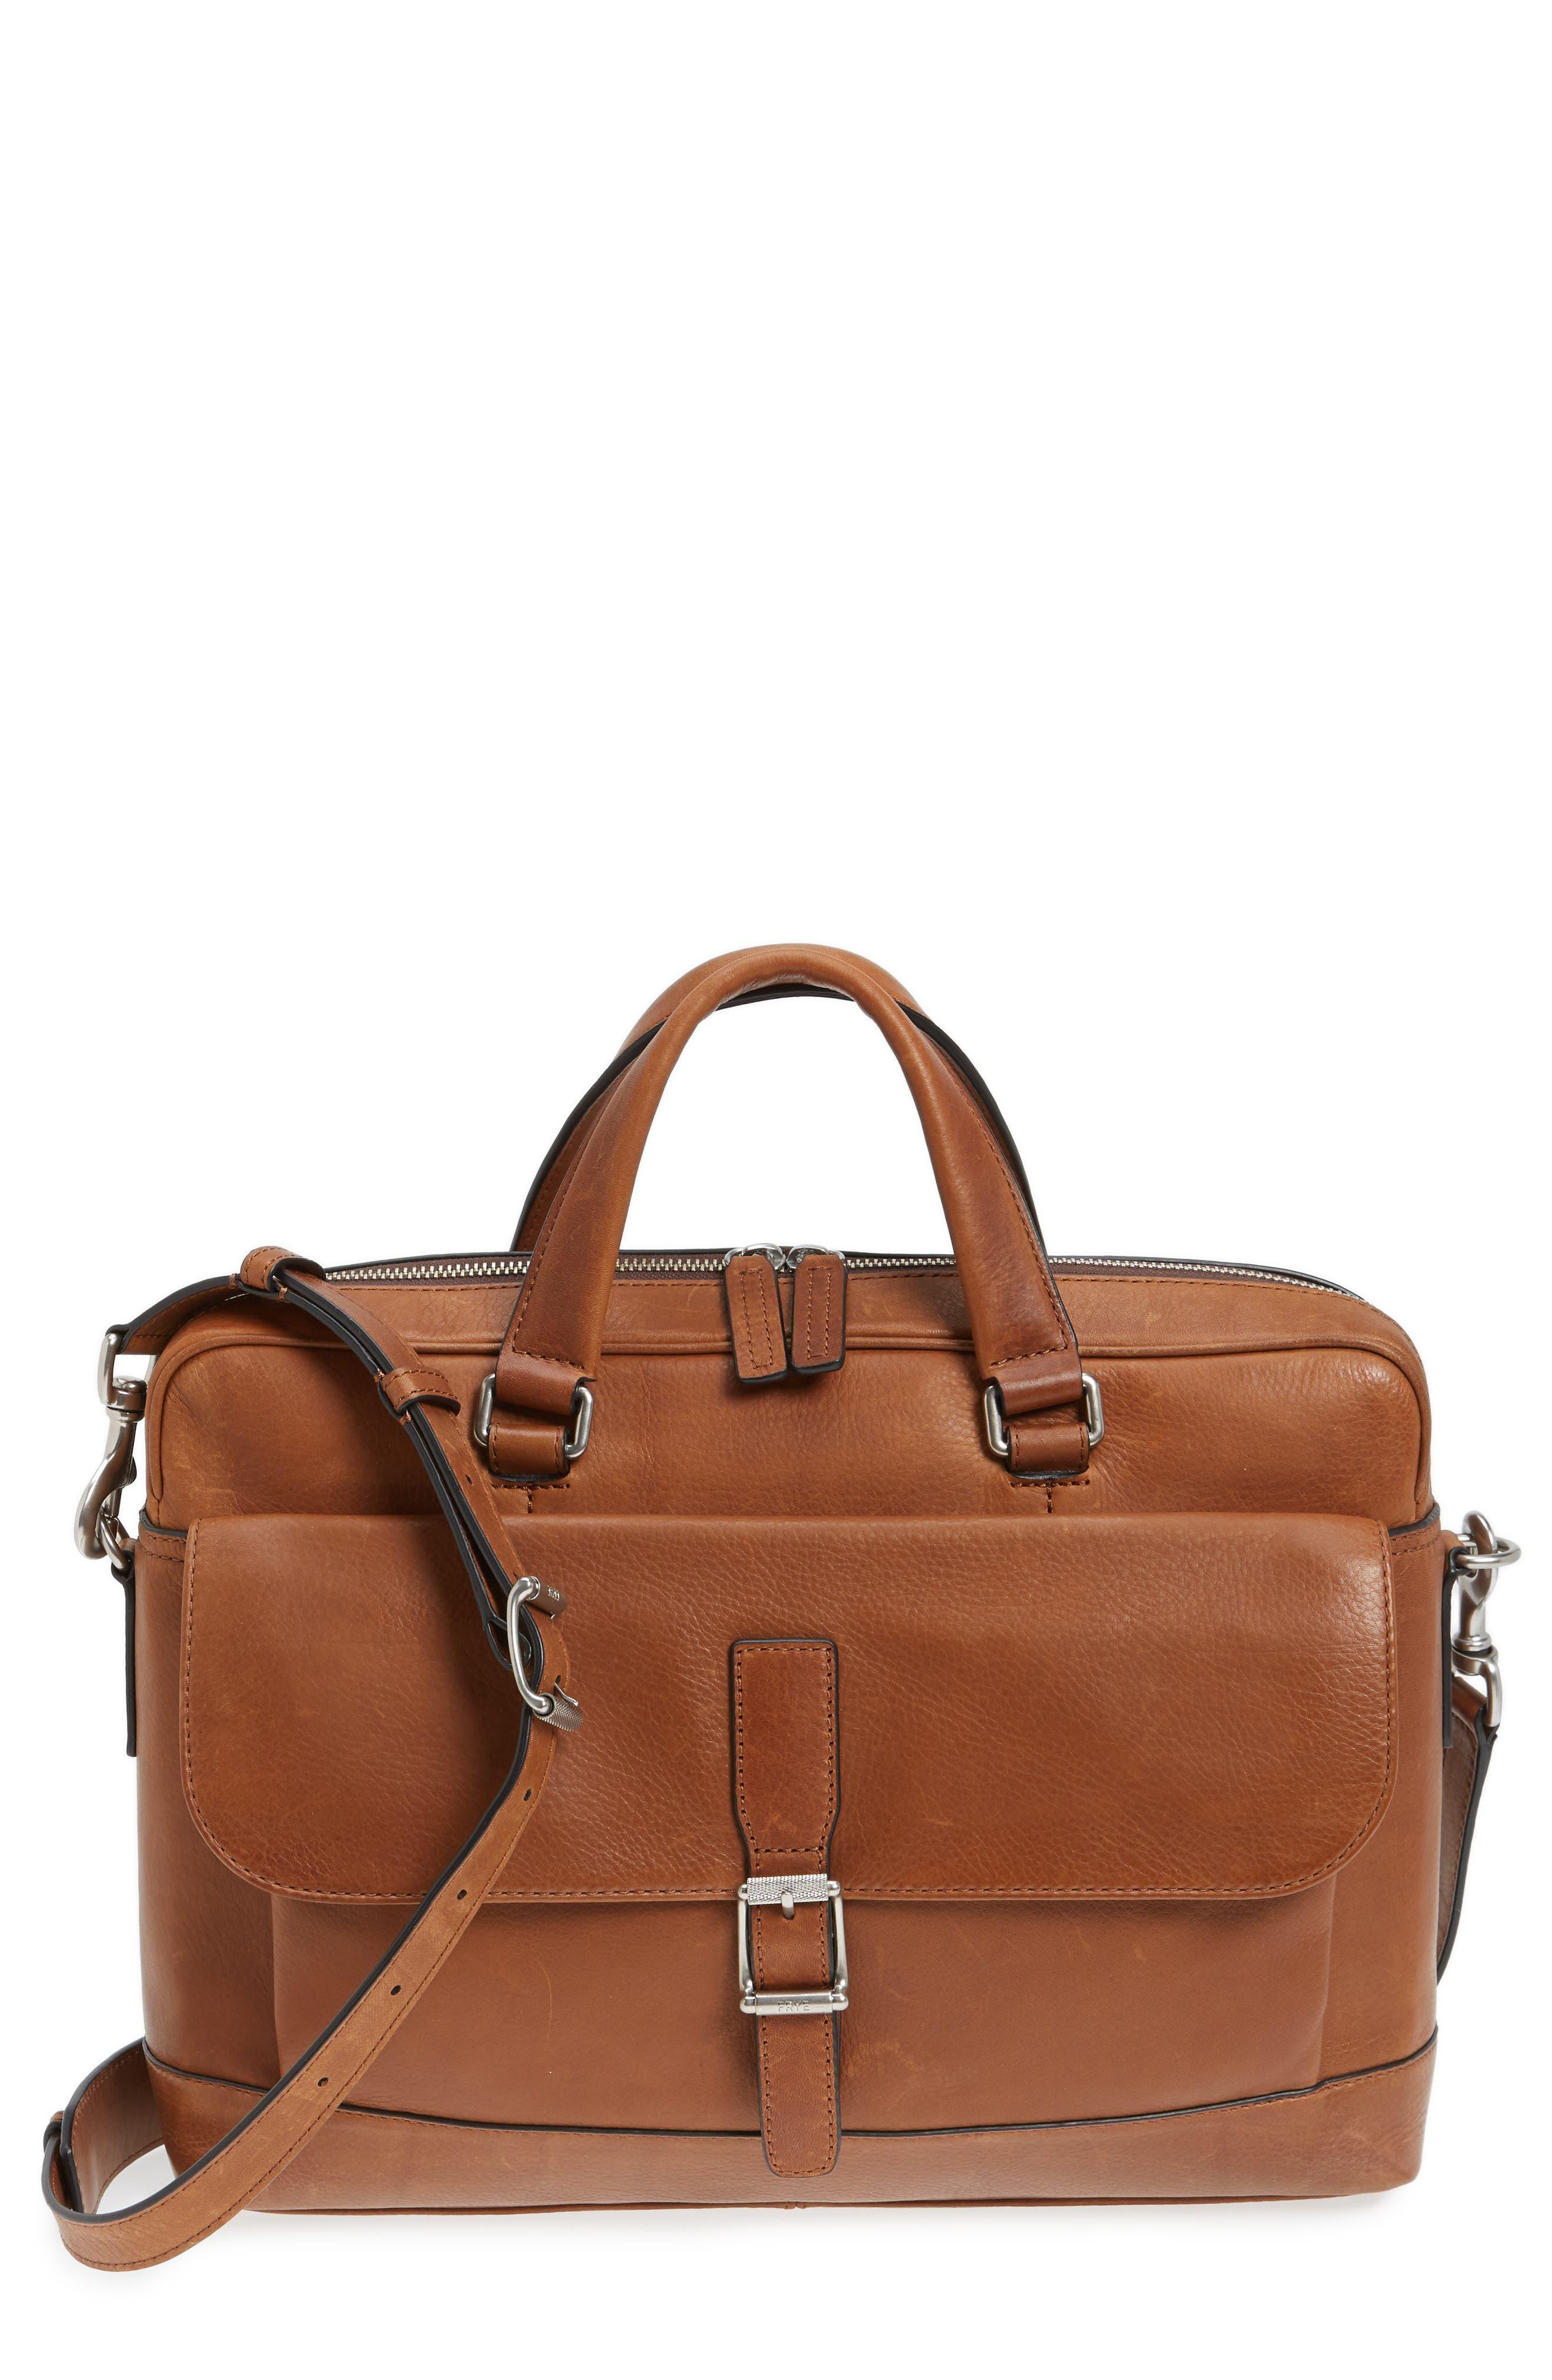 Oliver Leather Briefcase,                             Main thumbnail 1, color,                             Cognac